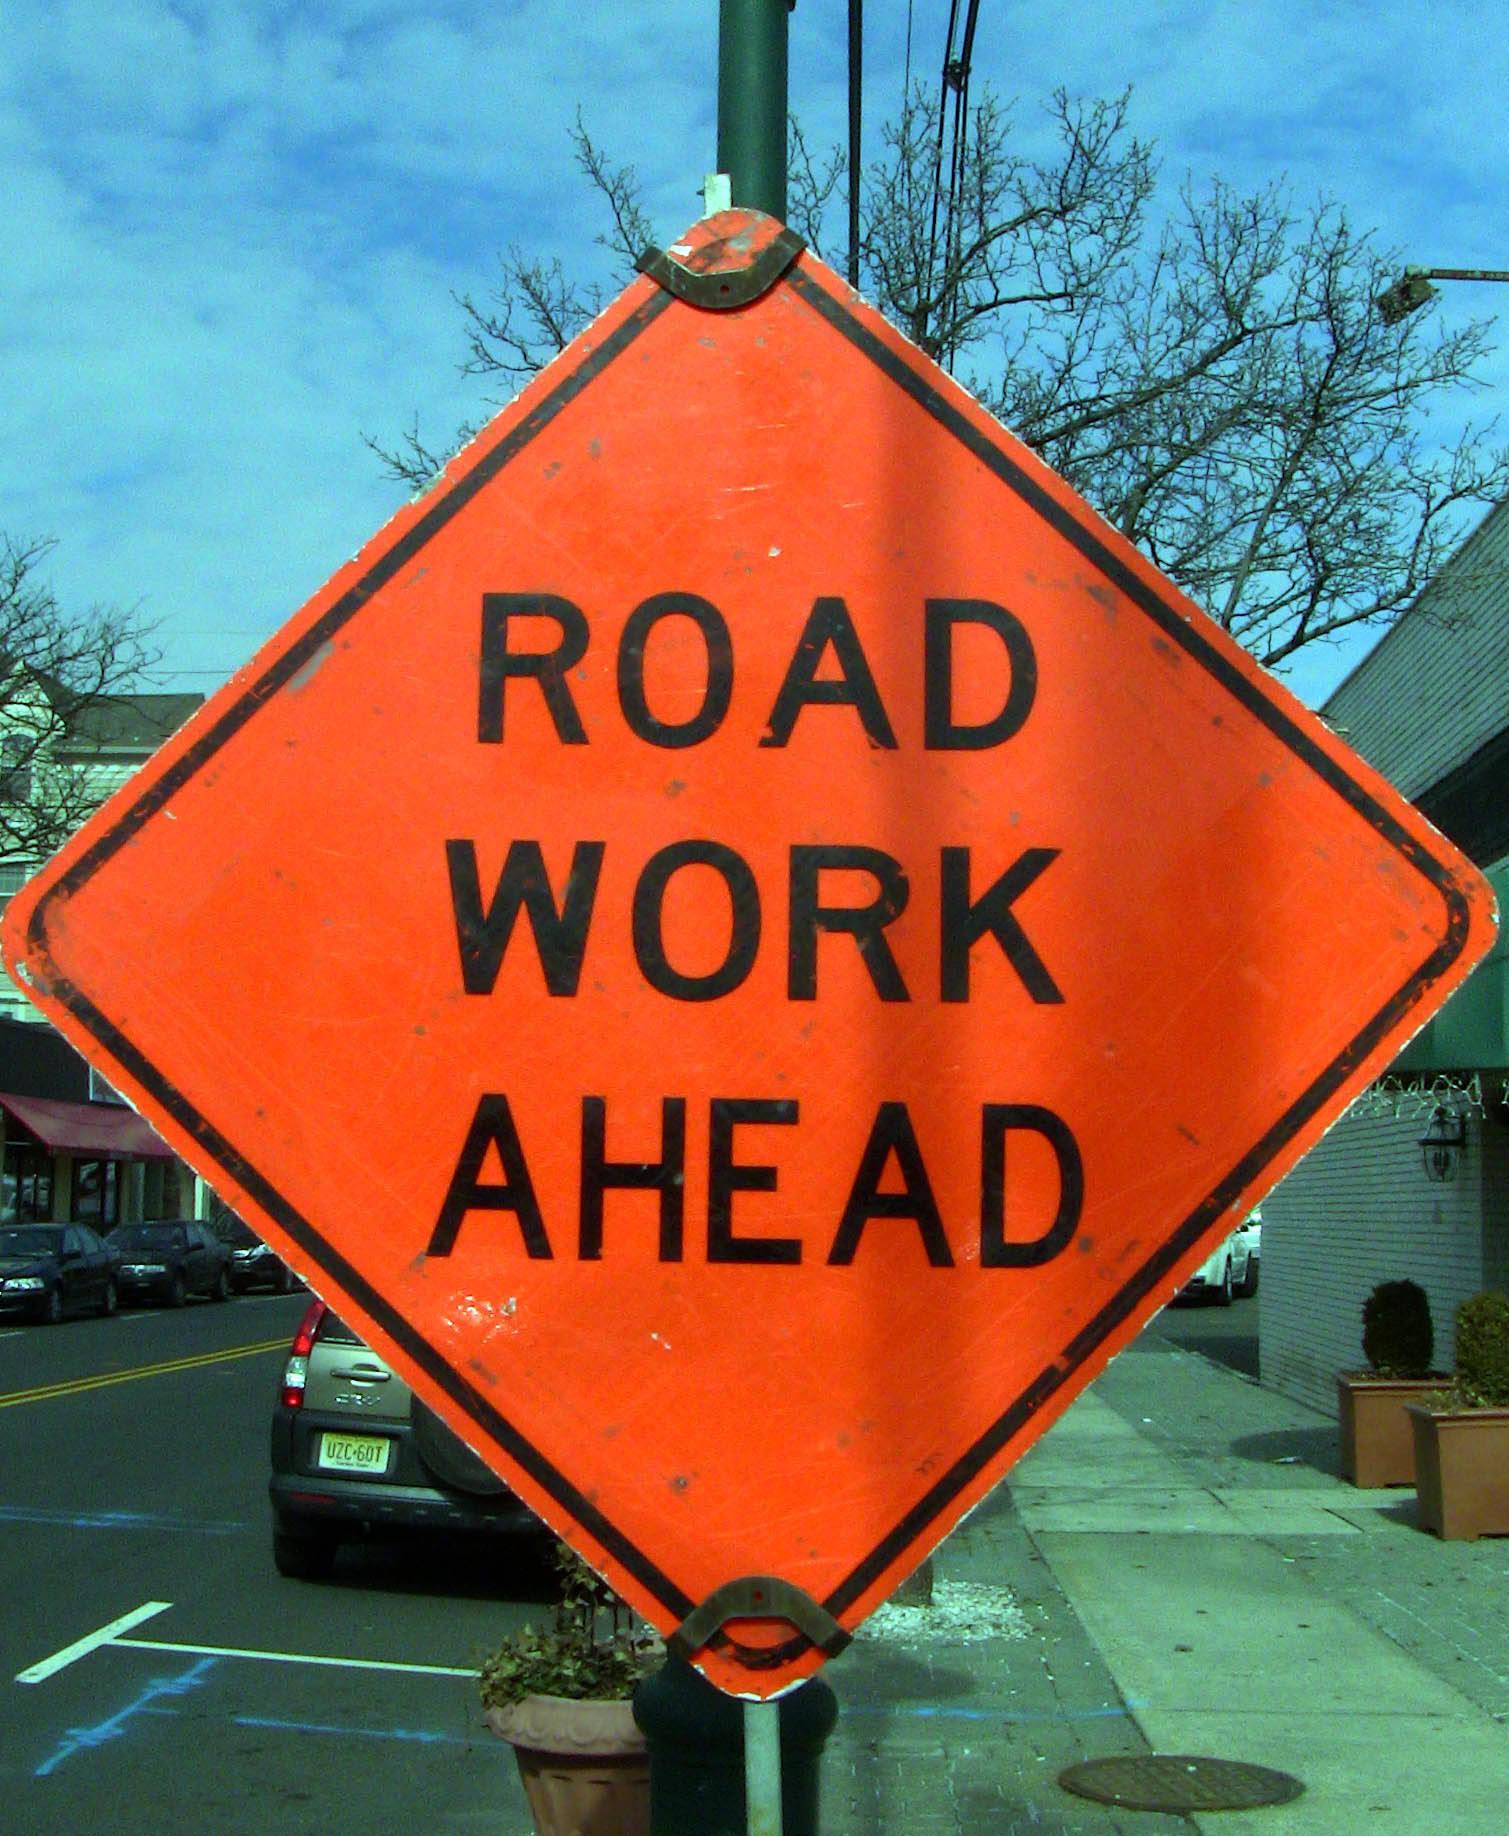 08112bd61fd35619c888_d677e1c8fea25285fa2e_Road_Work_Ahead_sign.jpg